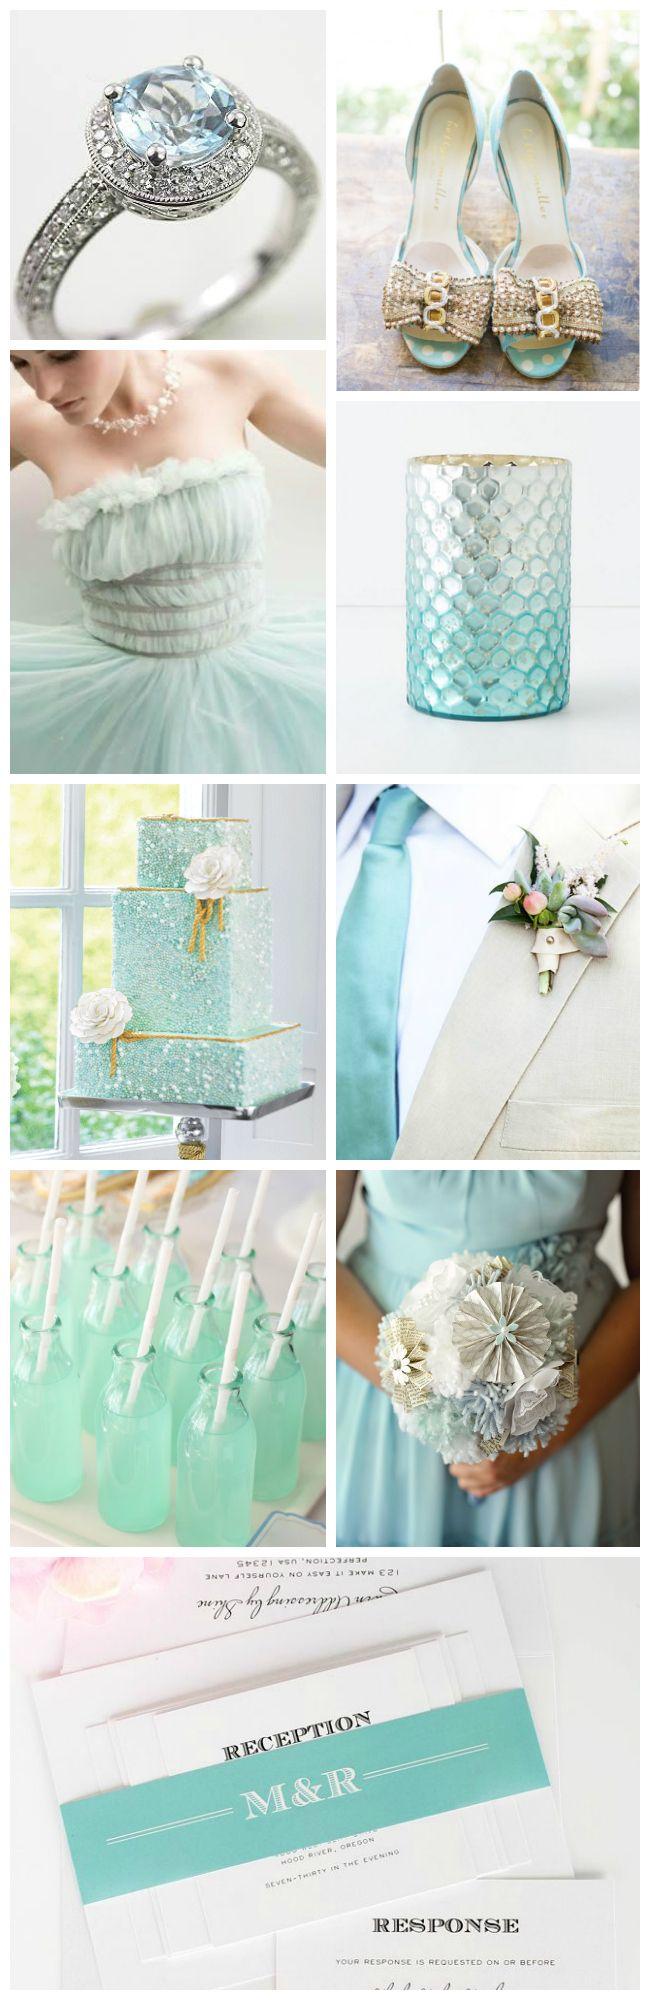 Aquamarine Wedding Inspiration - Find the matching invites here: http://www.shineweddinginvitations.com/wedding-invitations/antique-vintage-wedding-invitations